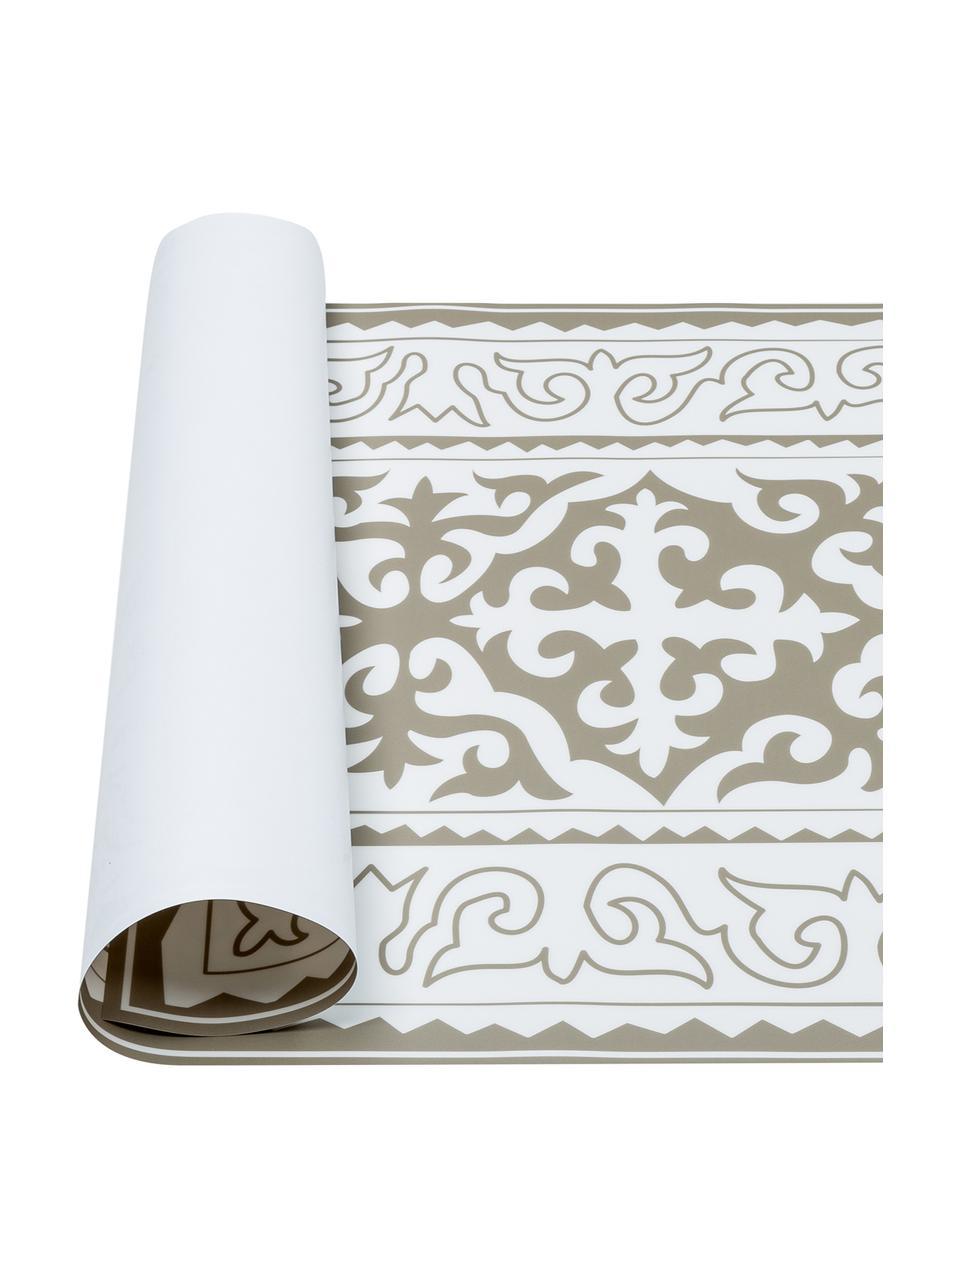 Vlakke vinyl vloermat Aksana in taupe / wit, antislip, Recyclebaar vinyl, Wit, taupe, 136 x 203 cm